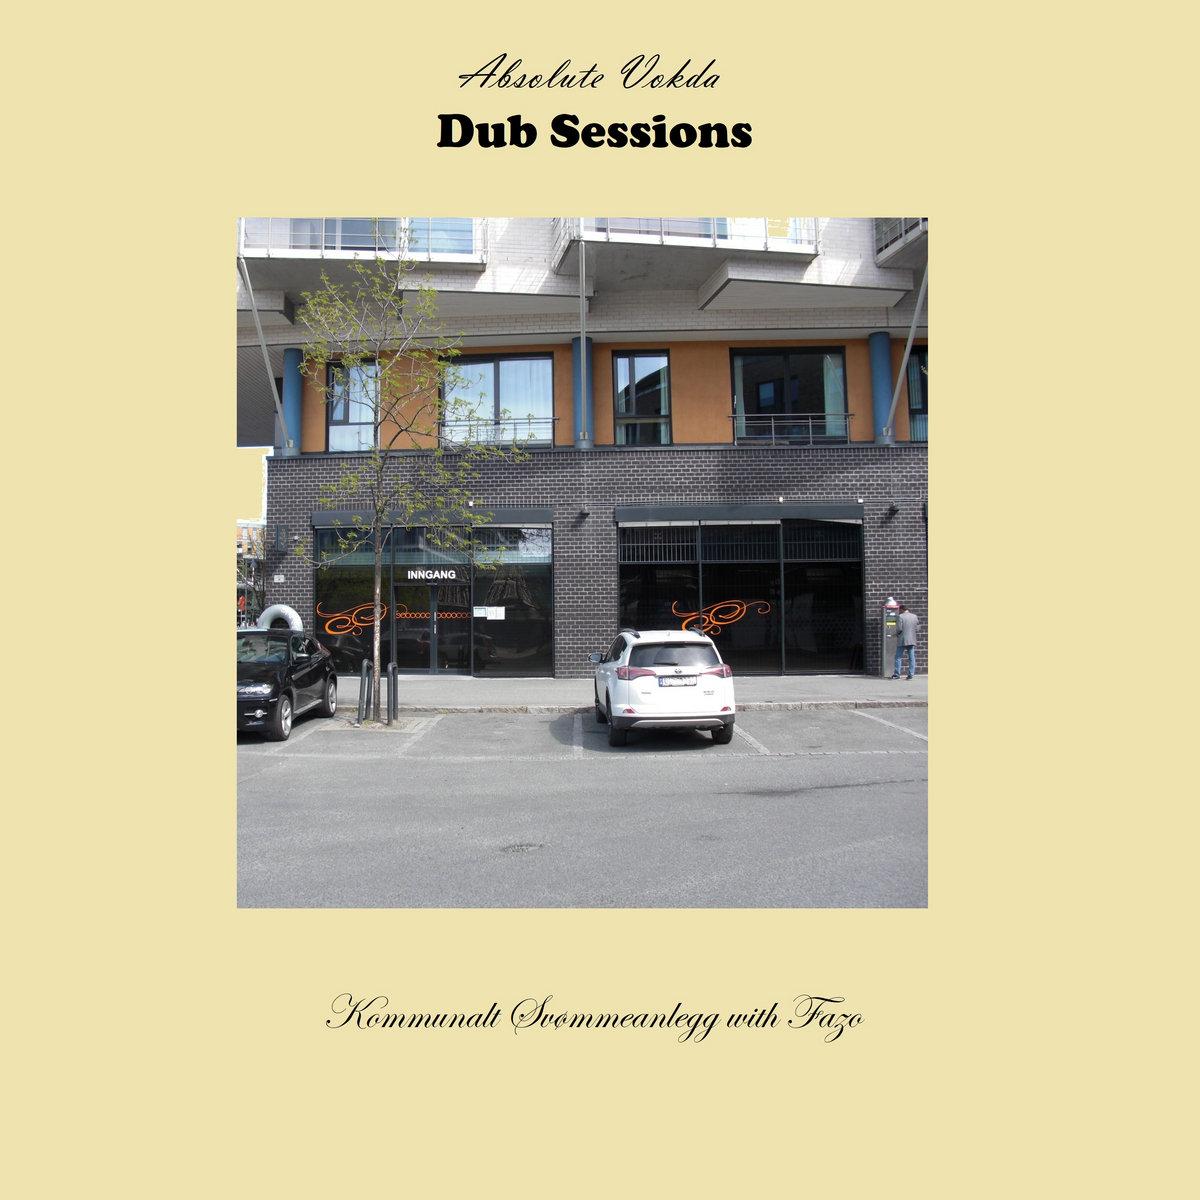 RioD-Dub | Kommunalt Svømmeanlegg with Fazo | Kommunalt Svømmeanlegg